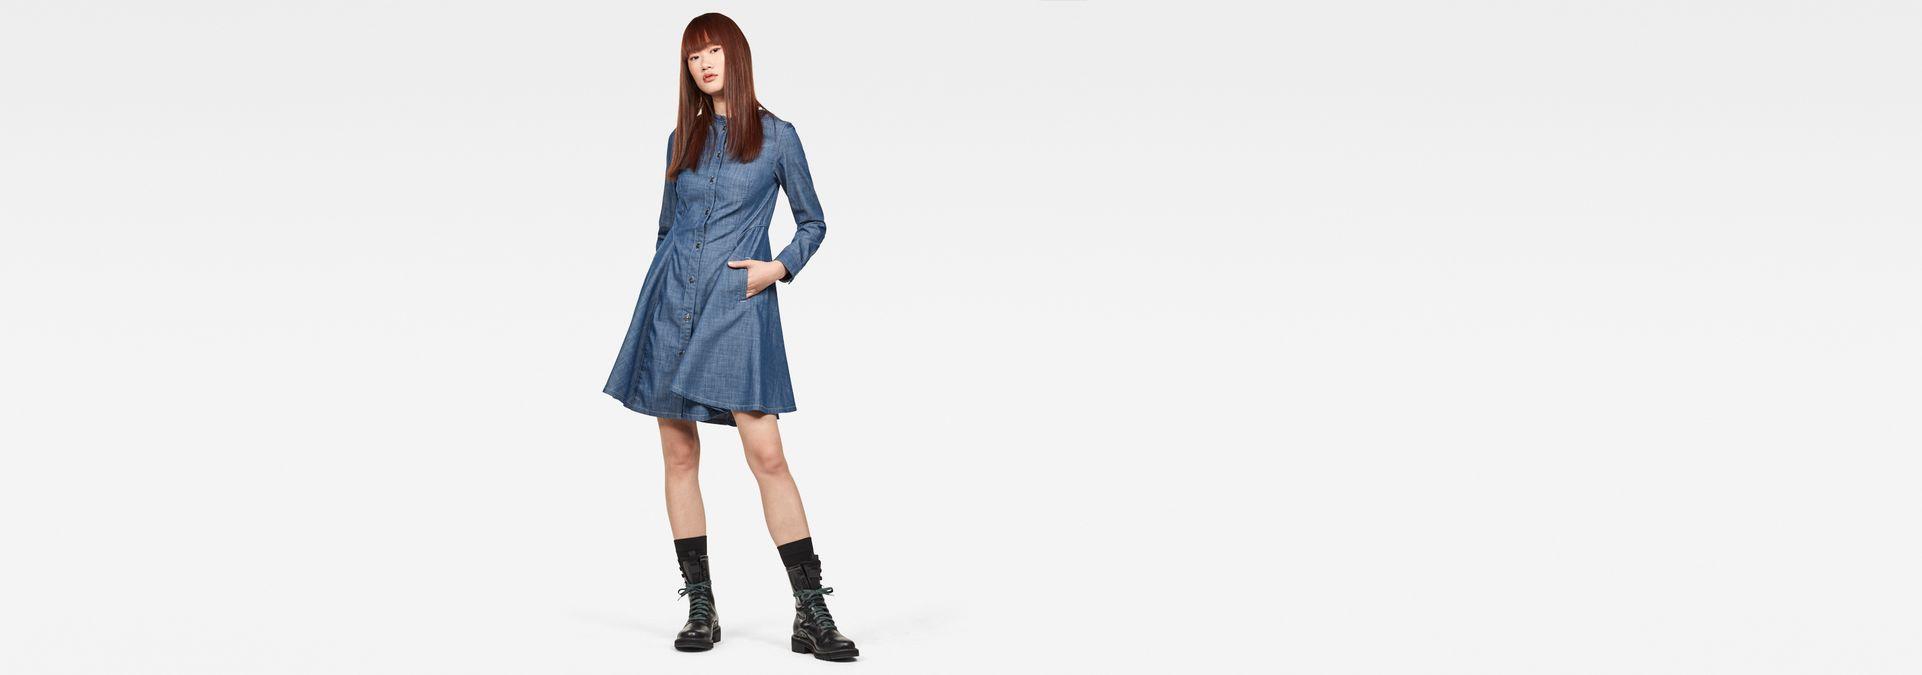 Bristum Slim Flare Fringe Dress by G Star